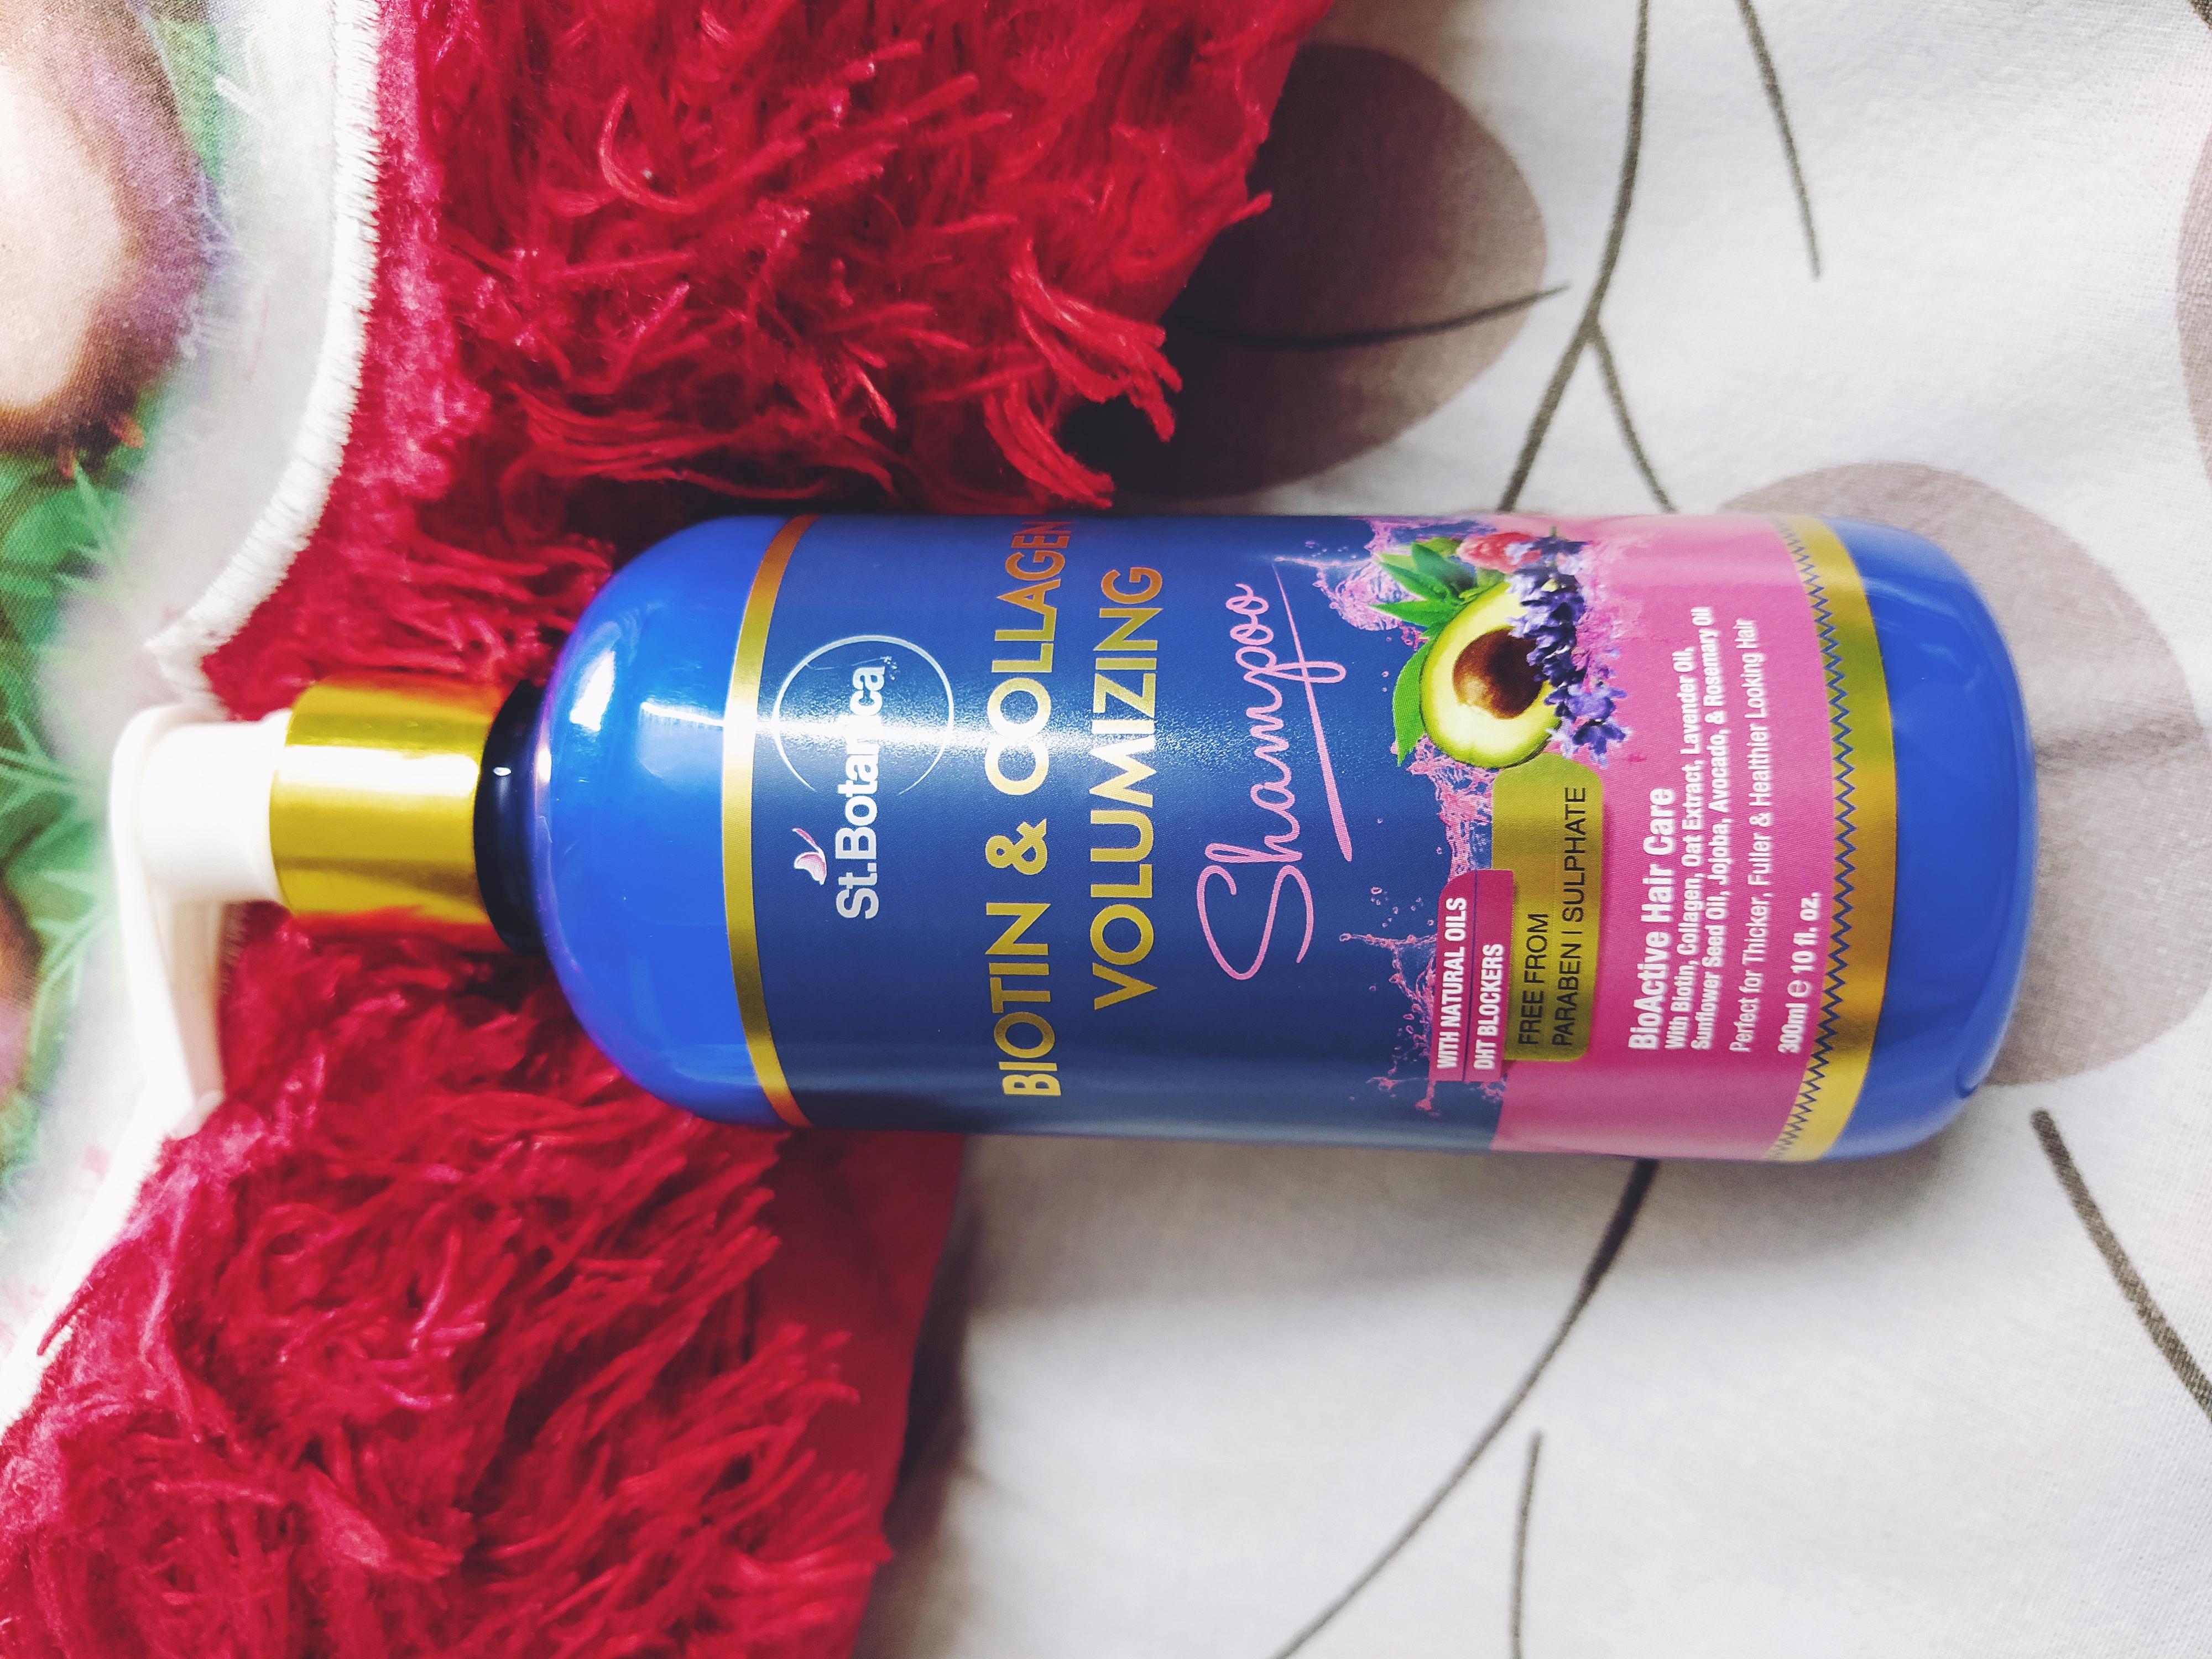 St.Botanica Biotin & Collagen Volumizing Hair Shampoo-Volumize your hair.-By isharajput883-2